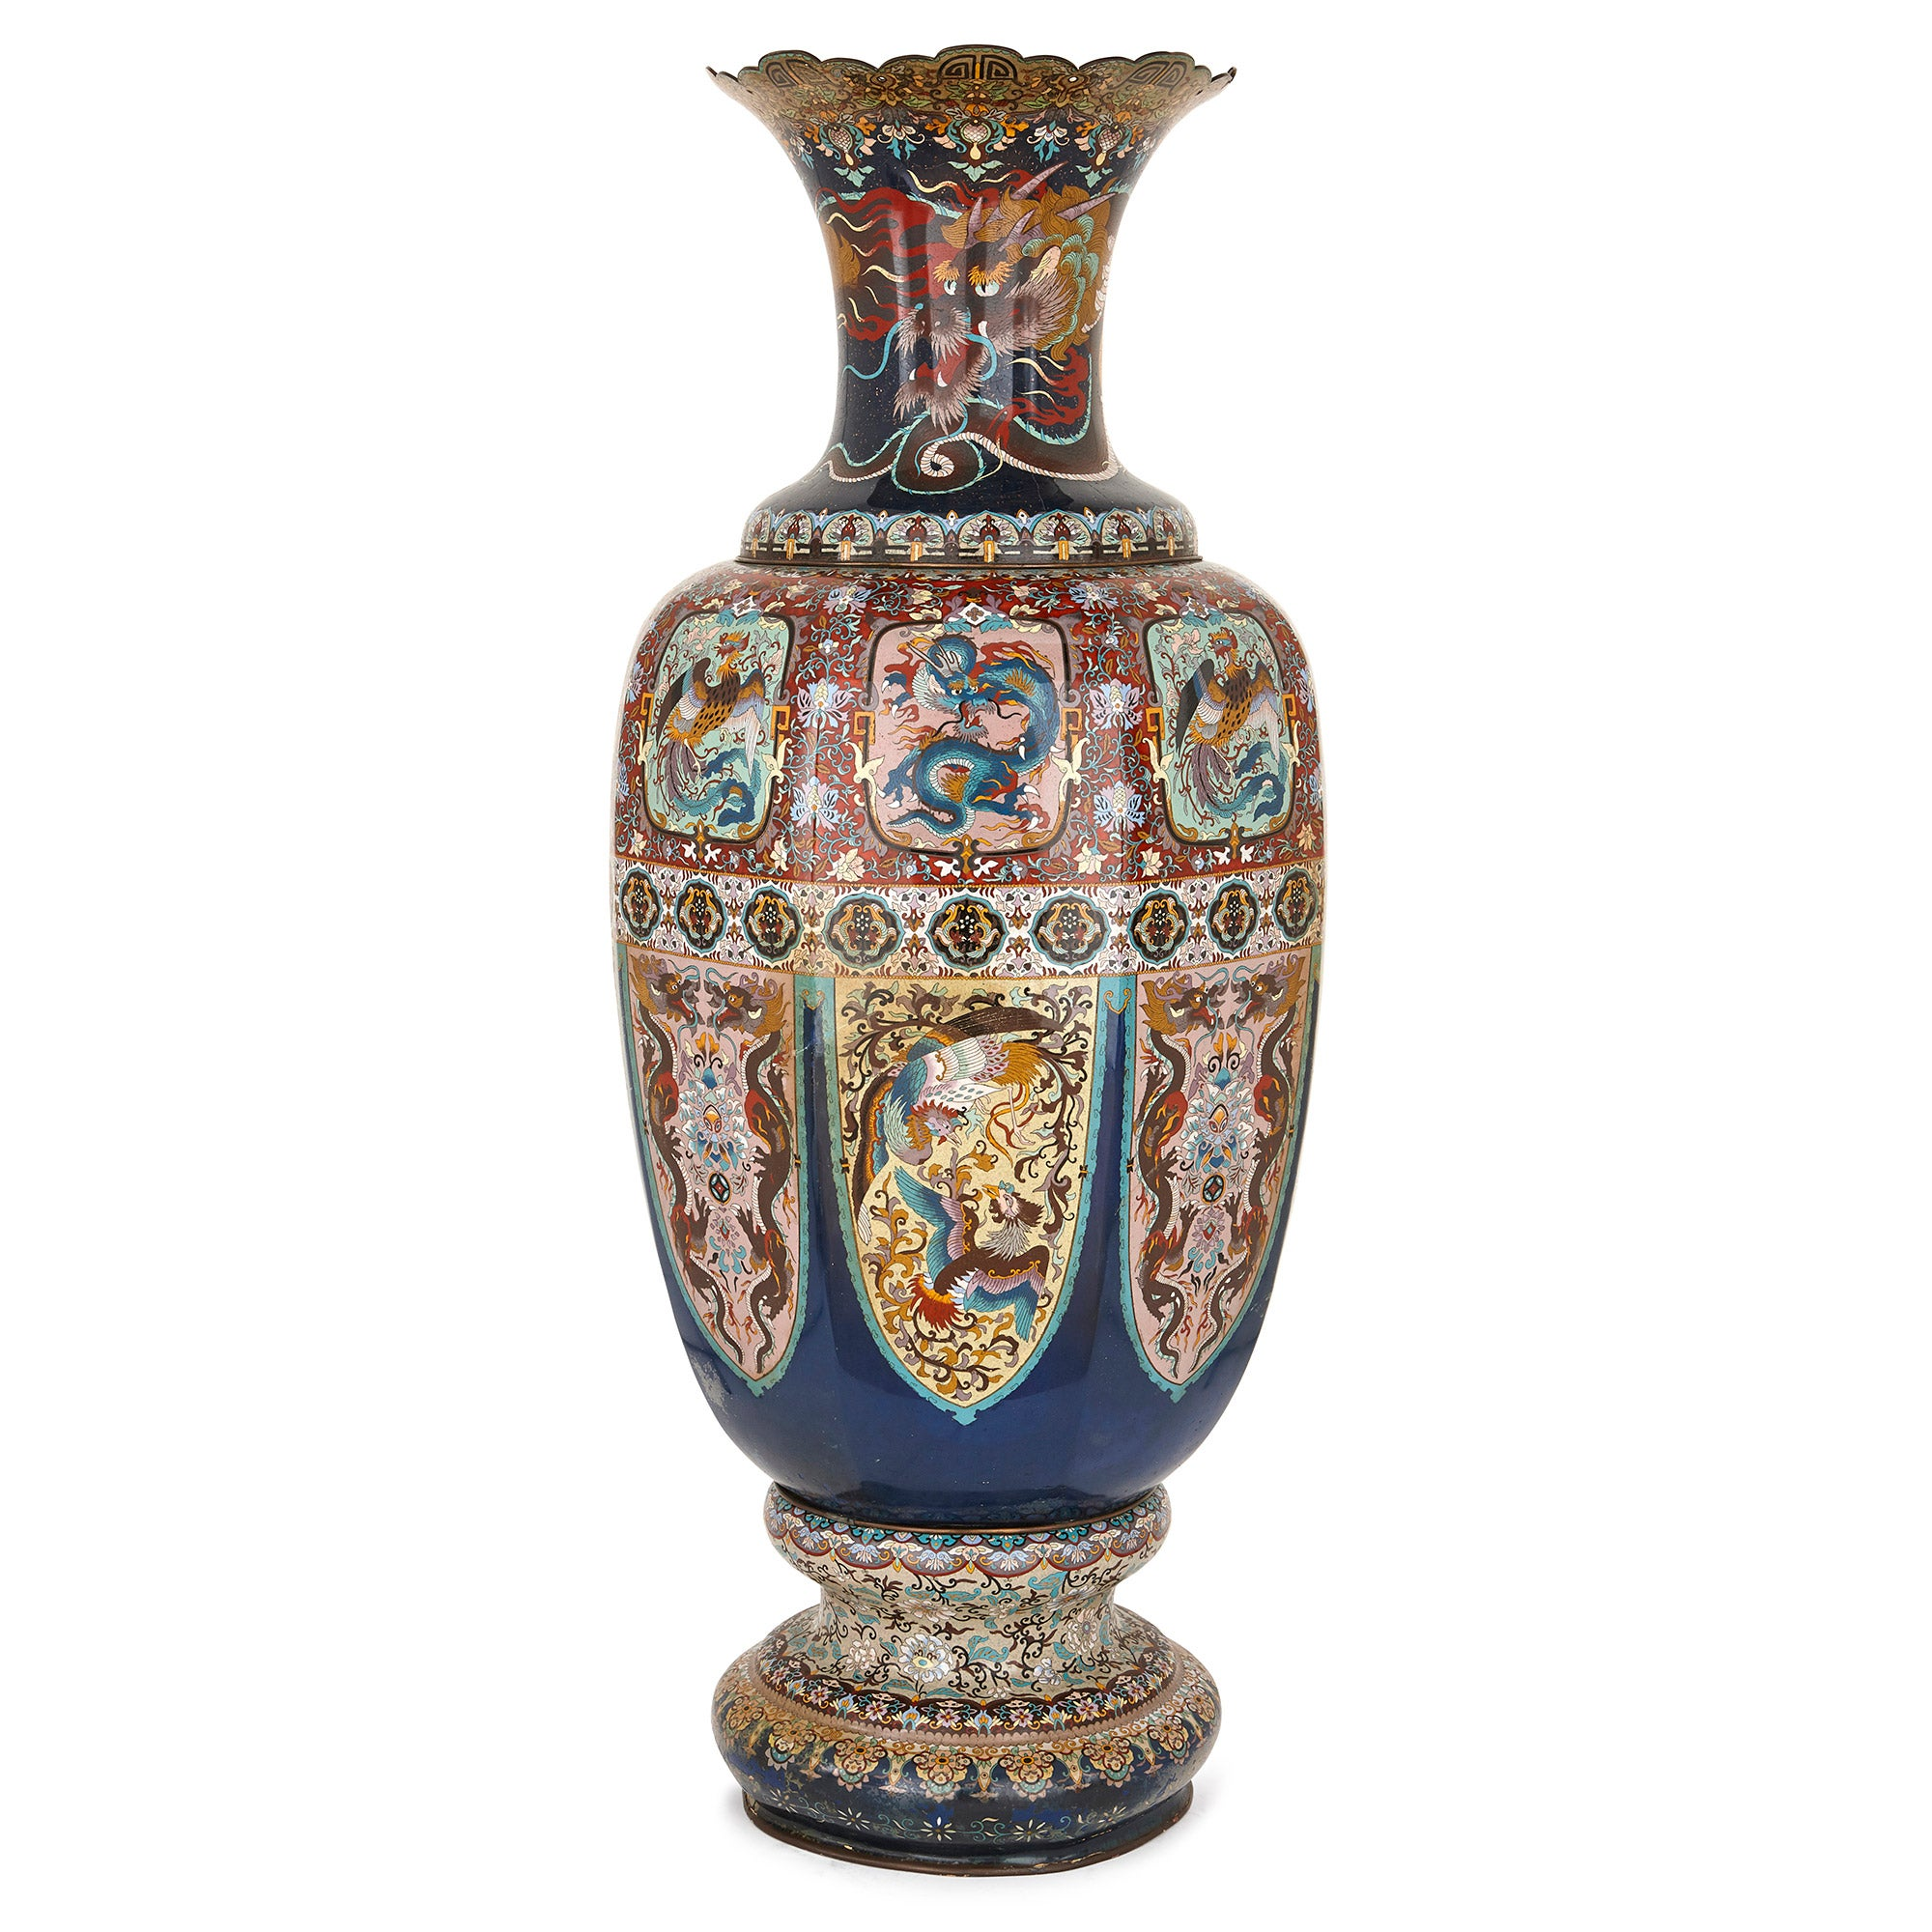 Late 19th Century Japanese Cloisonne Enamel 'Dragon' Vase